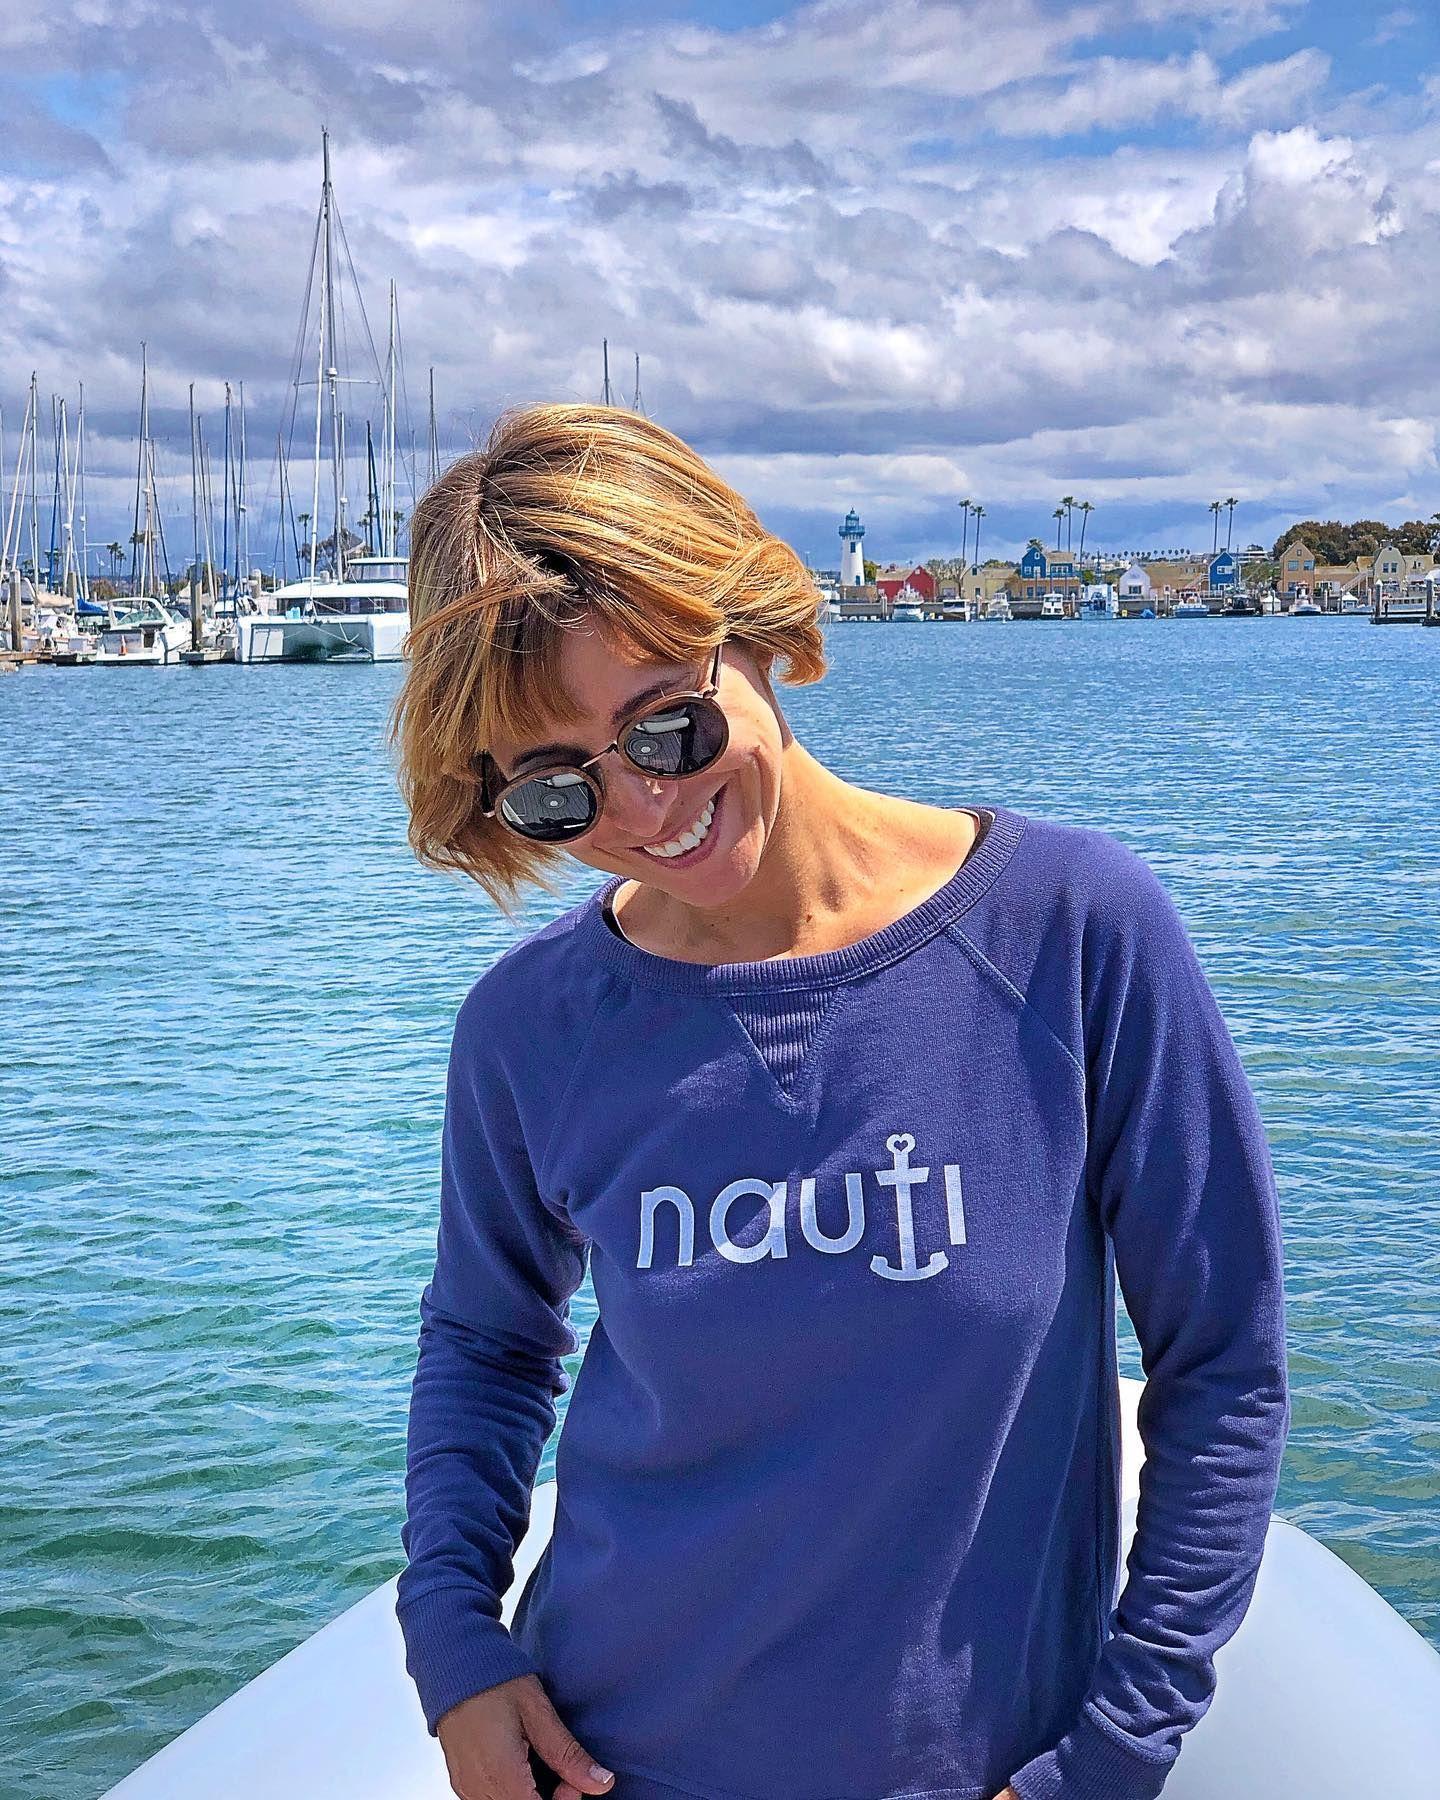 Ocean is my Back Yard  @shopnauti #nauticalfashion #quarantinelife . : : : : : : #nautical #nauti #nauticalstyle #anchorsweater #shopnauti #covid2020 #quarantineandchill #oceanview #oceanlover #yachtlife #yachtbum #dinghycruising #brigboats #nauticaljewelry #anchorsaway #anchors #boats #yachts #yachting #sailing #sailingfashion #stayhomestaysafe #coronavid19 #onthewater #liveaboard